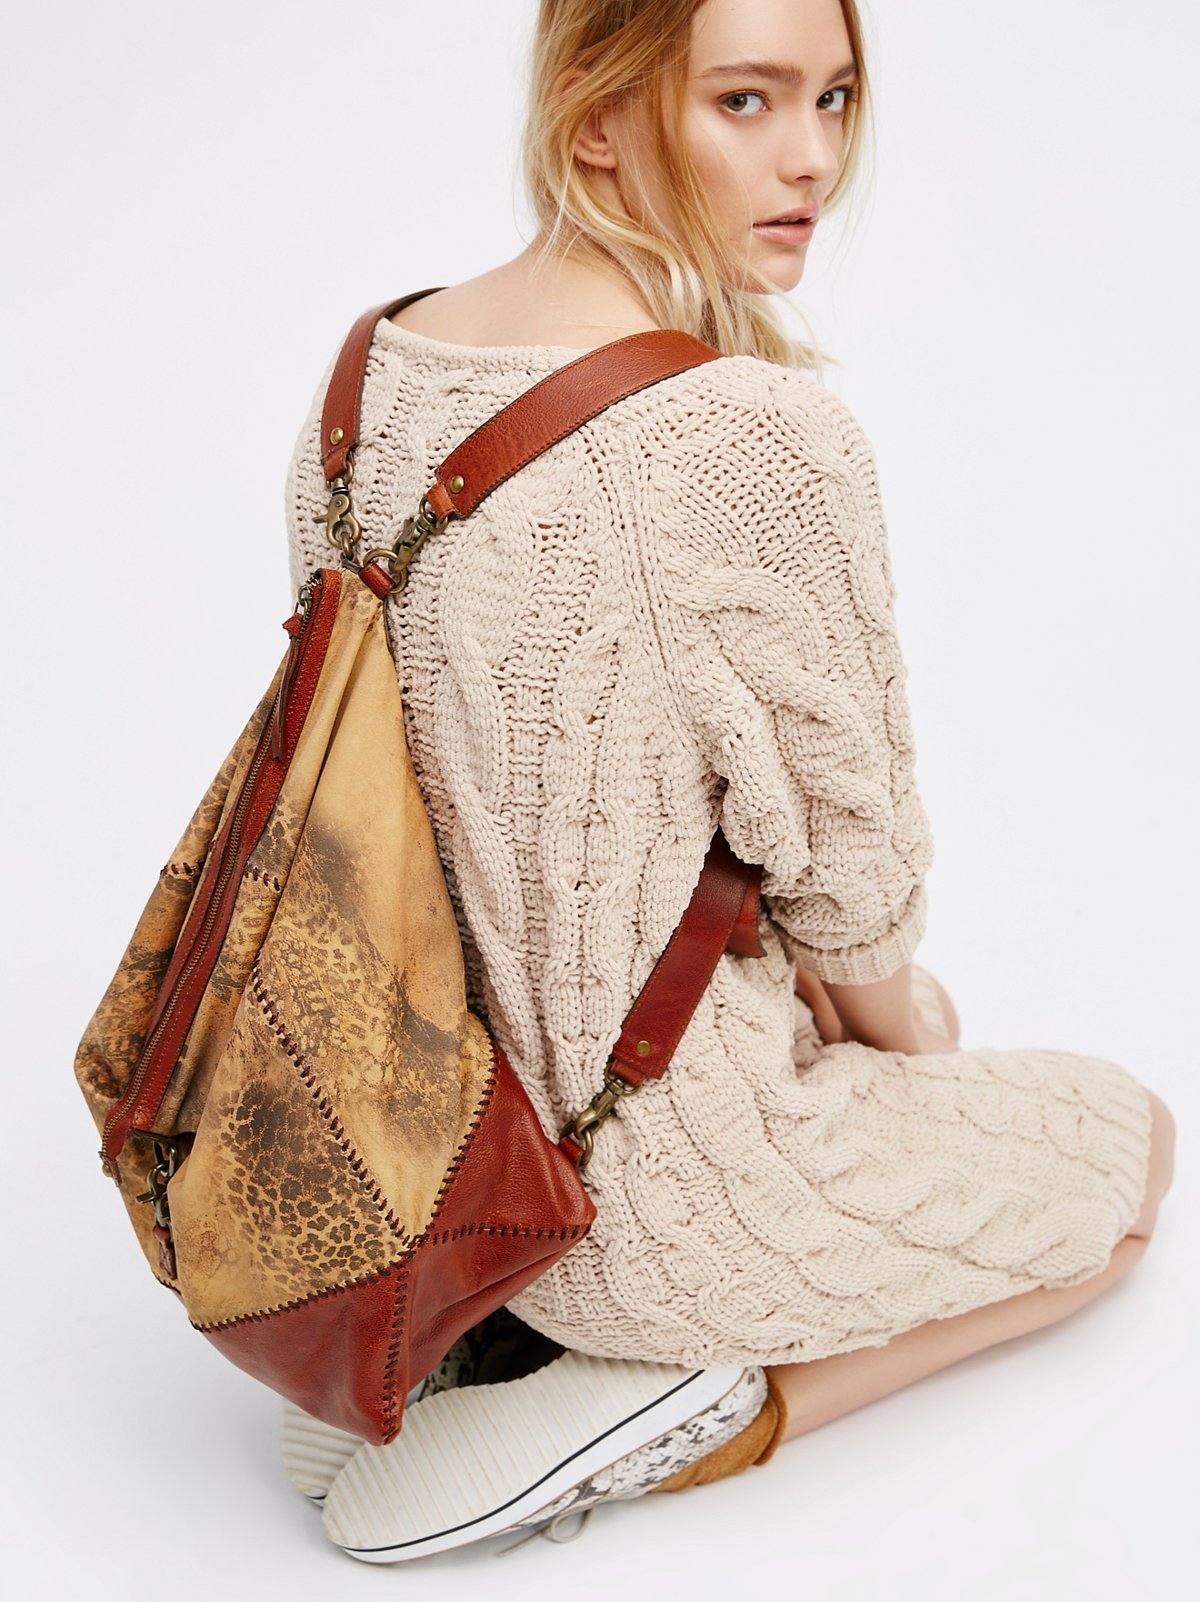 Brawley背包